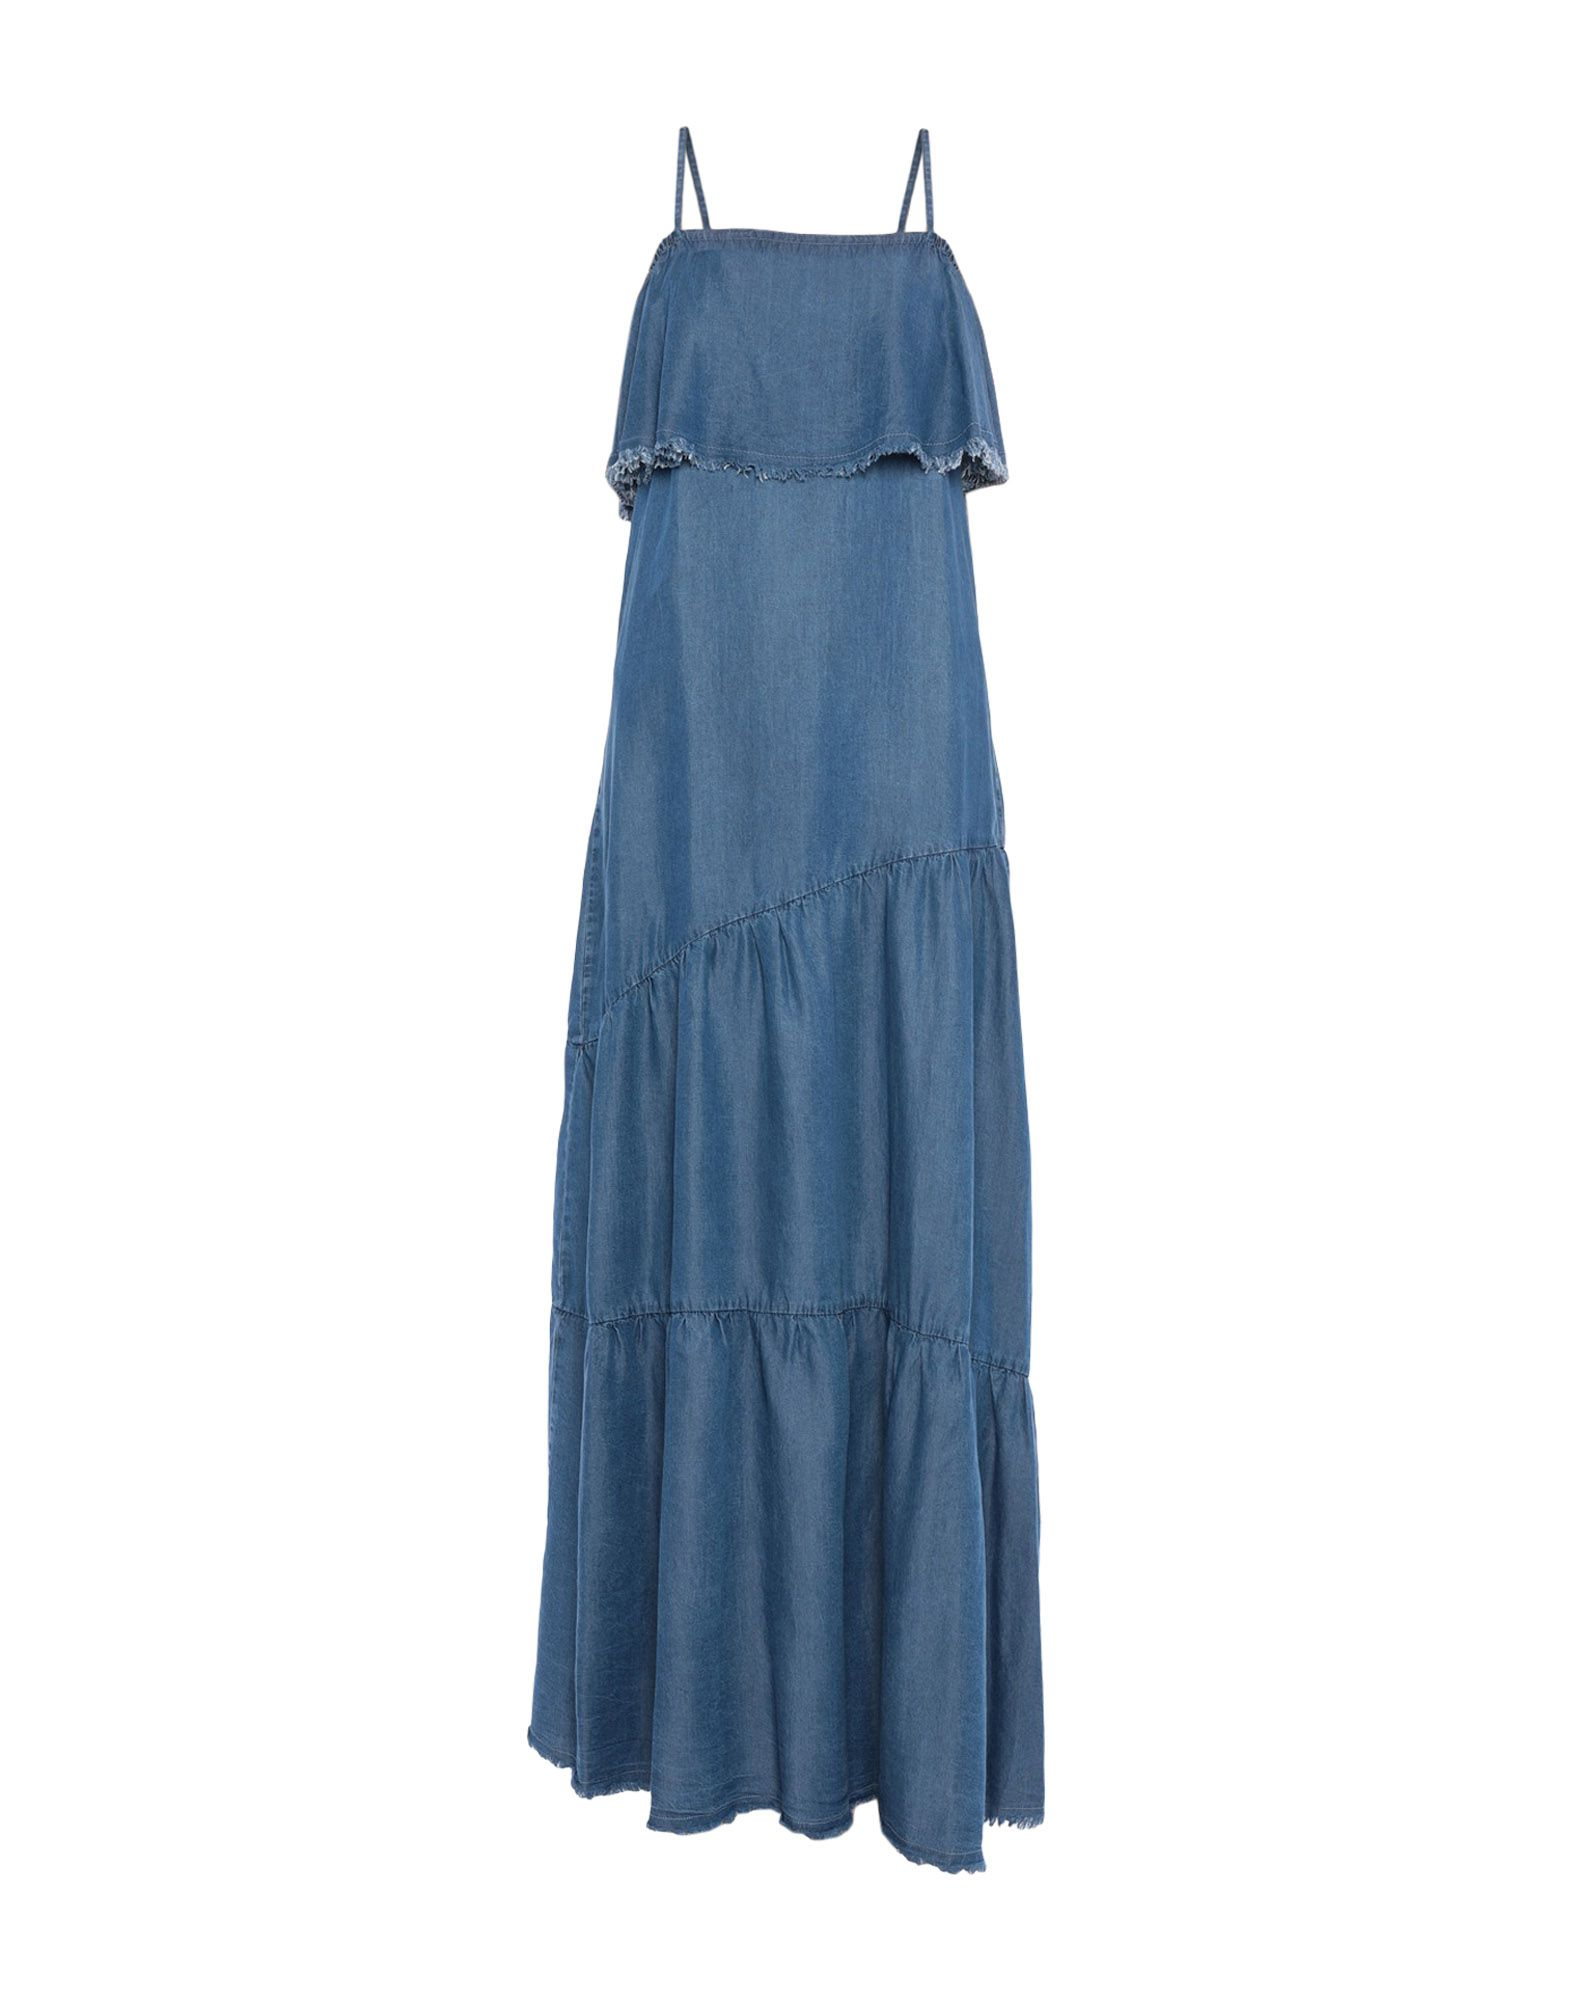 KOCCA Длинное платье платье kocca p17pab442205un0000 72274